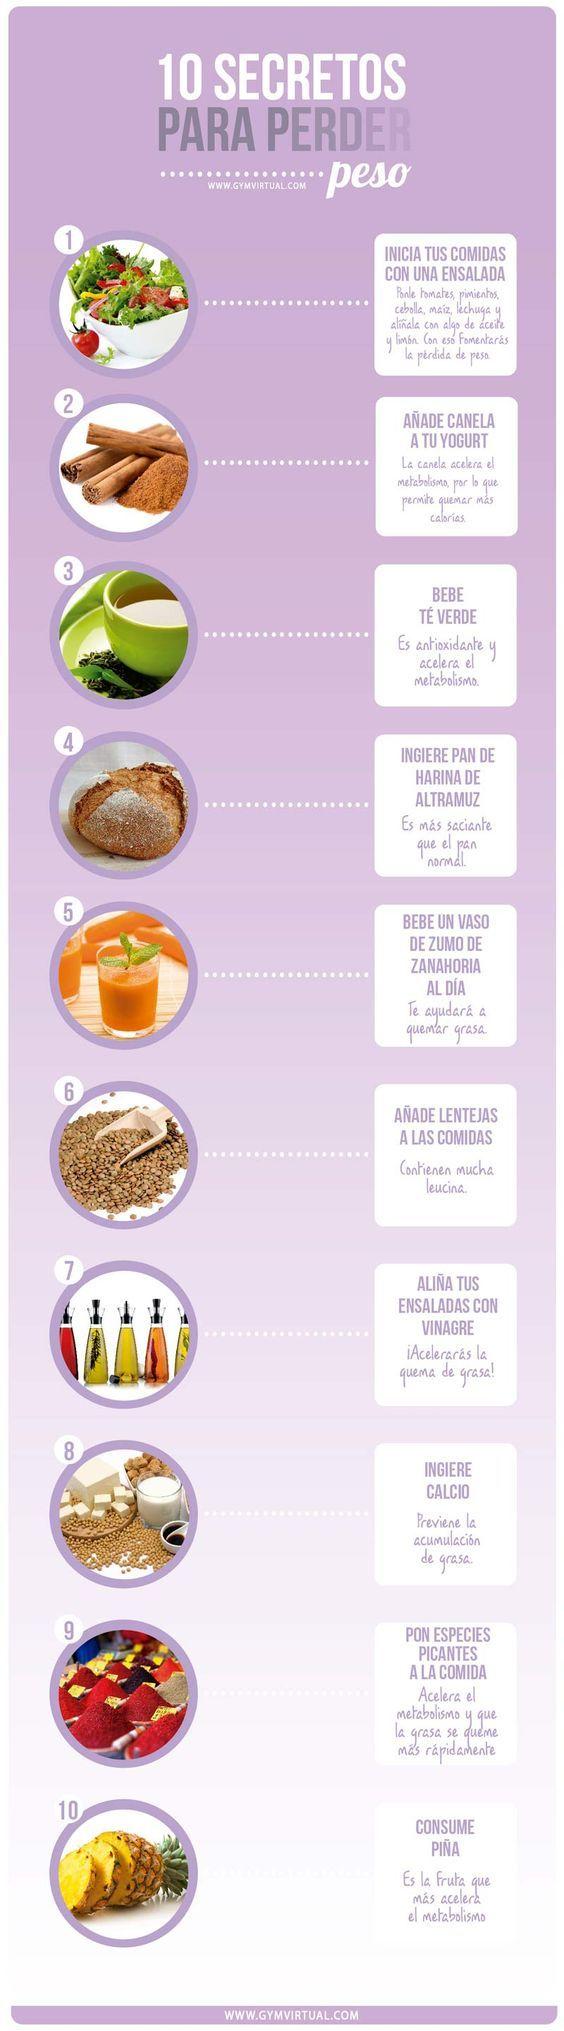 Bajar de peso por comida